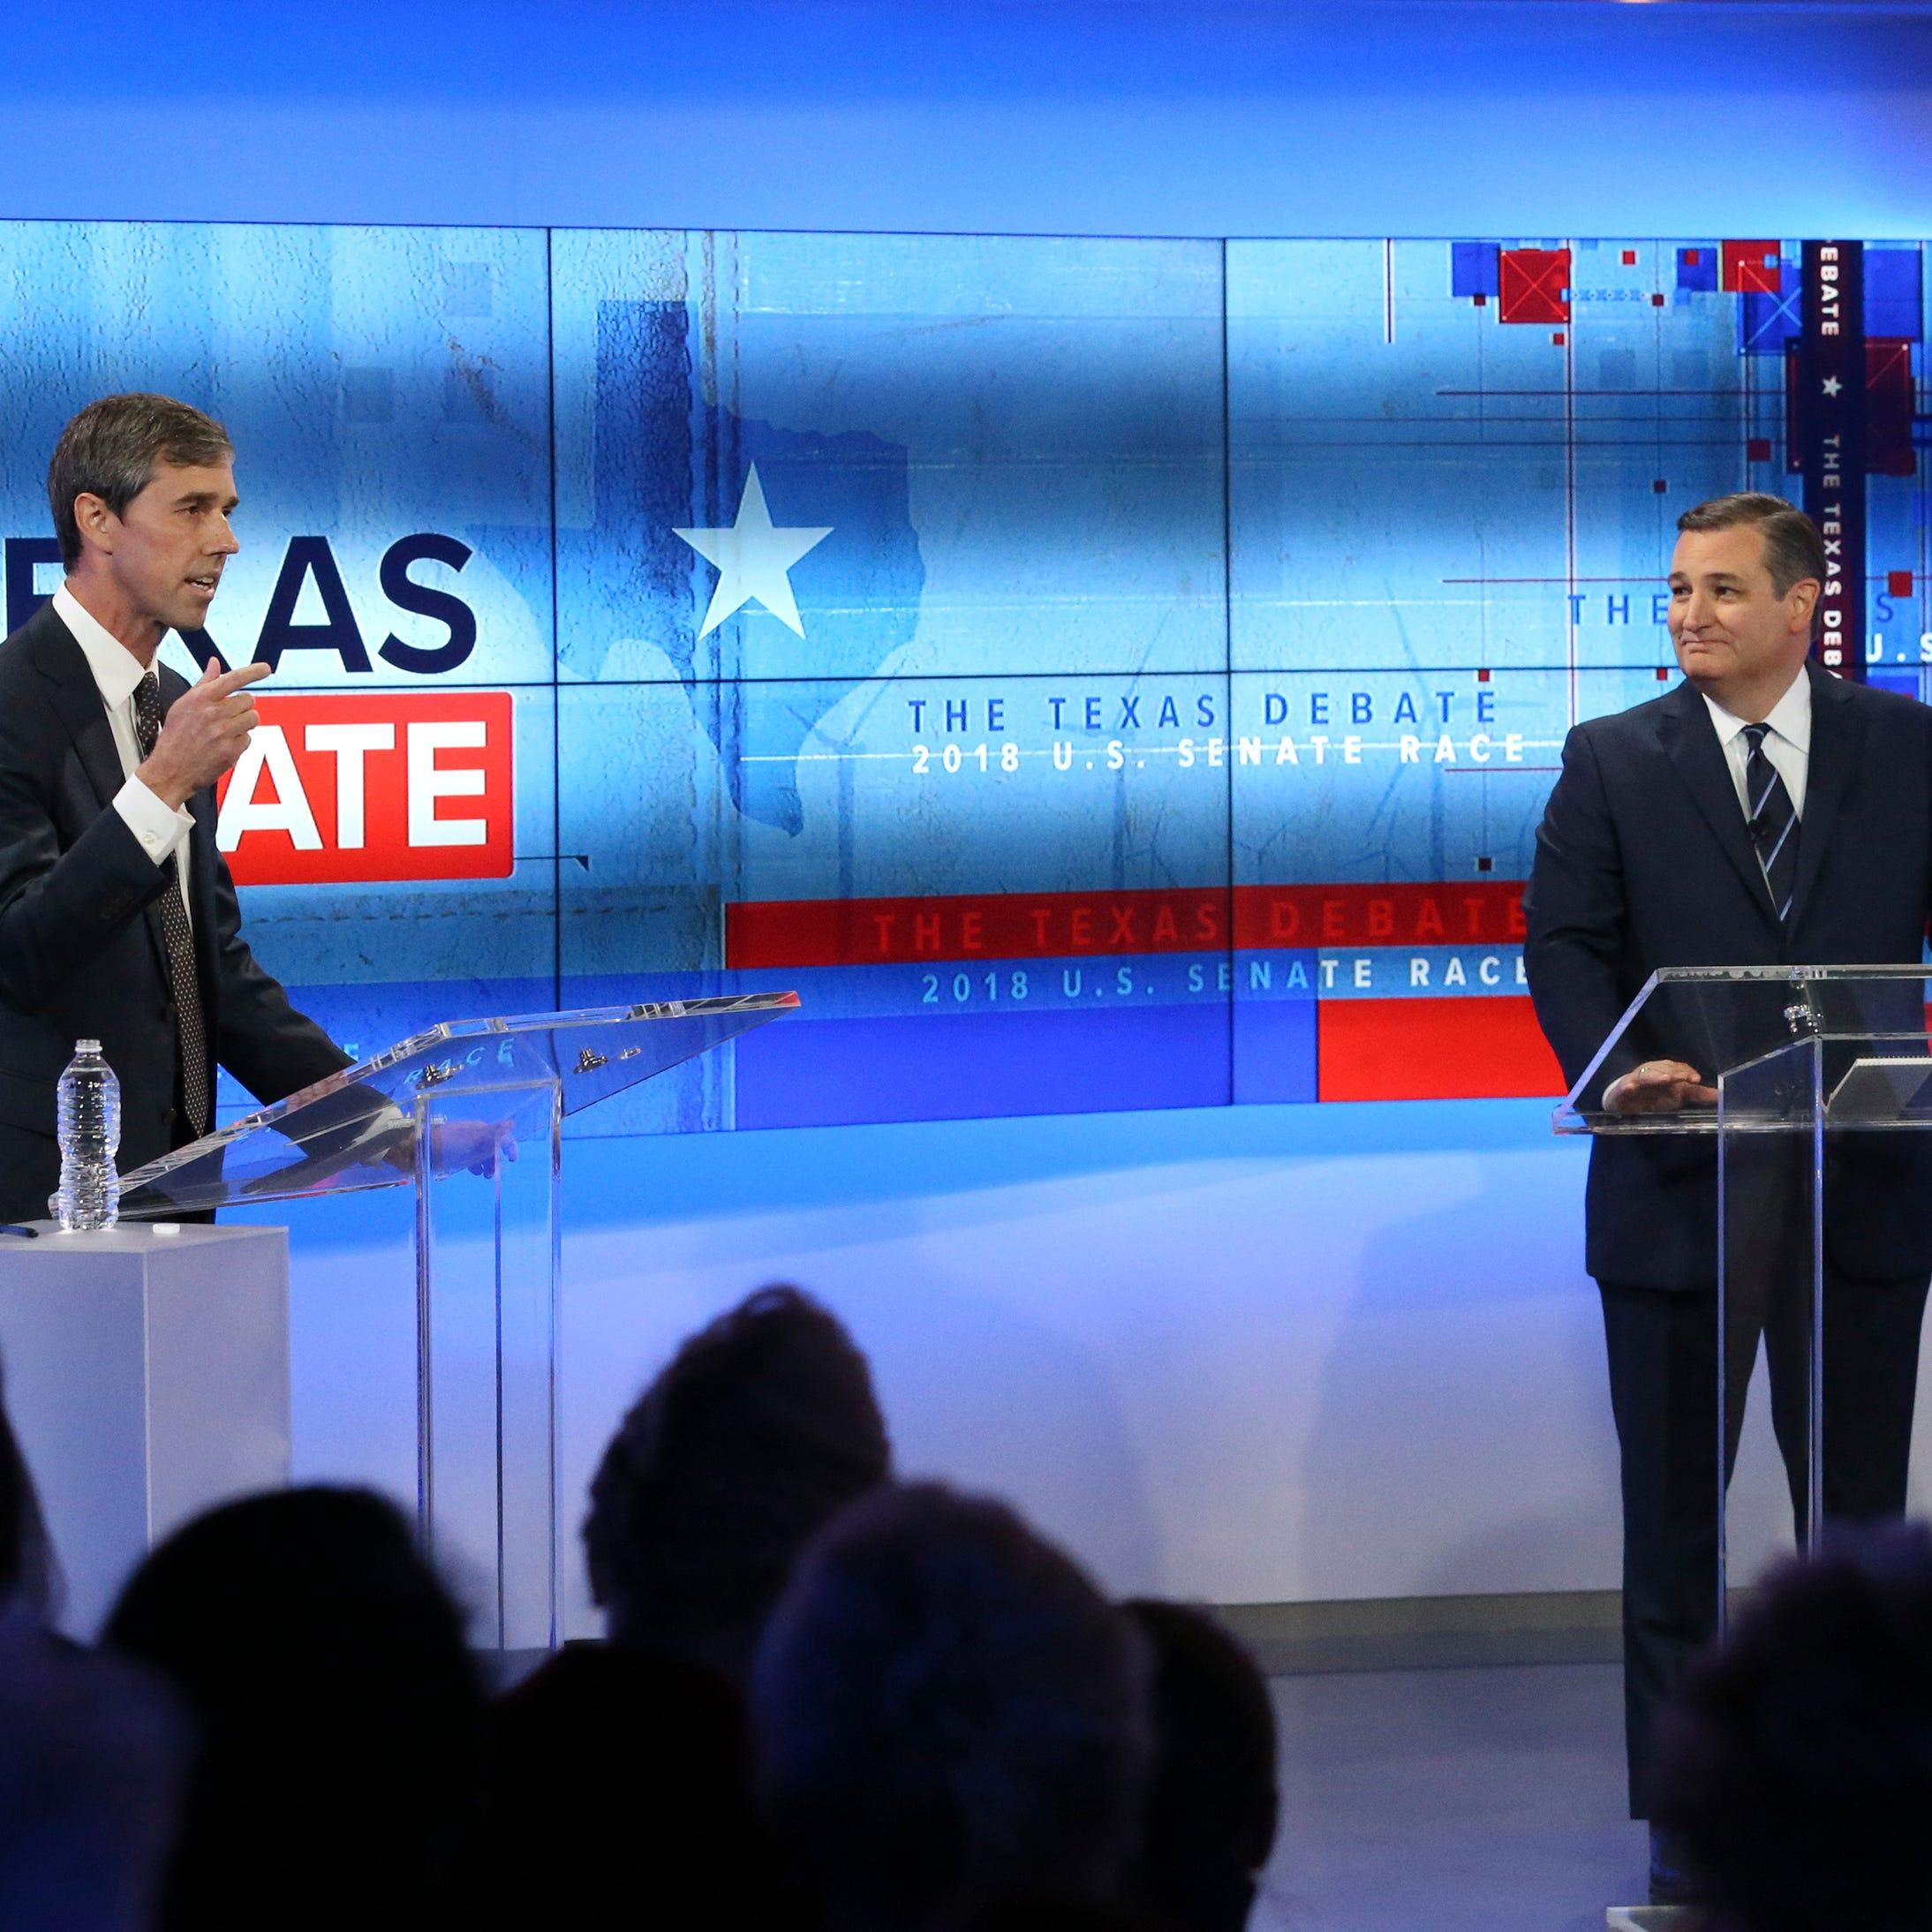 U.S. Rep. Beto O'Rourke, D-El Paso, left, and U.S. Sen. Ted Cruz, R-Texas, take part in a debate for the Texas U.S. Senate, Tuesday, Oct. 16, 2018, in San Antonio.